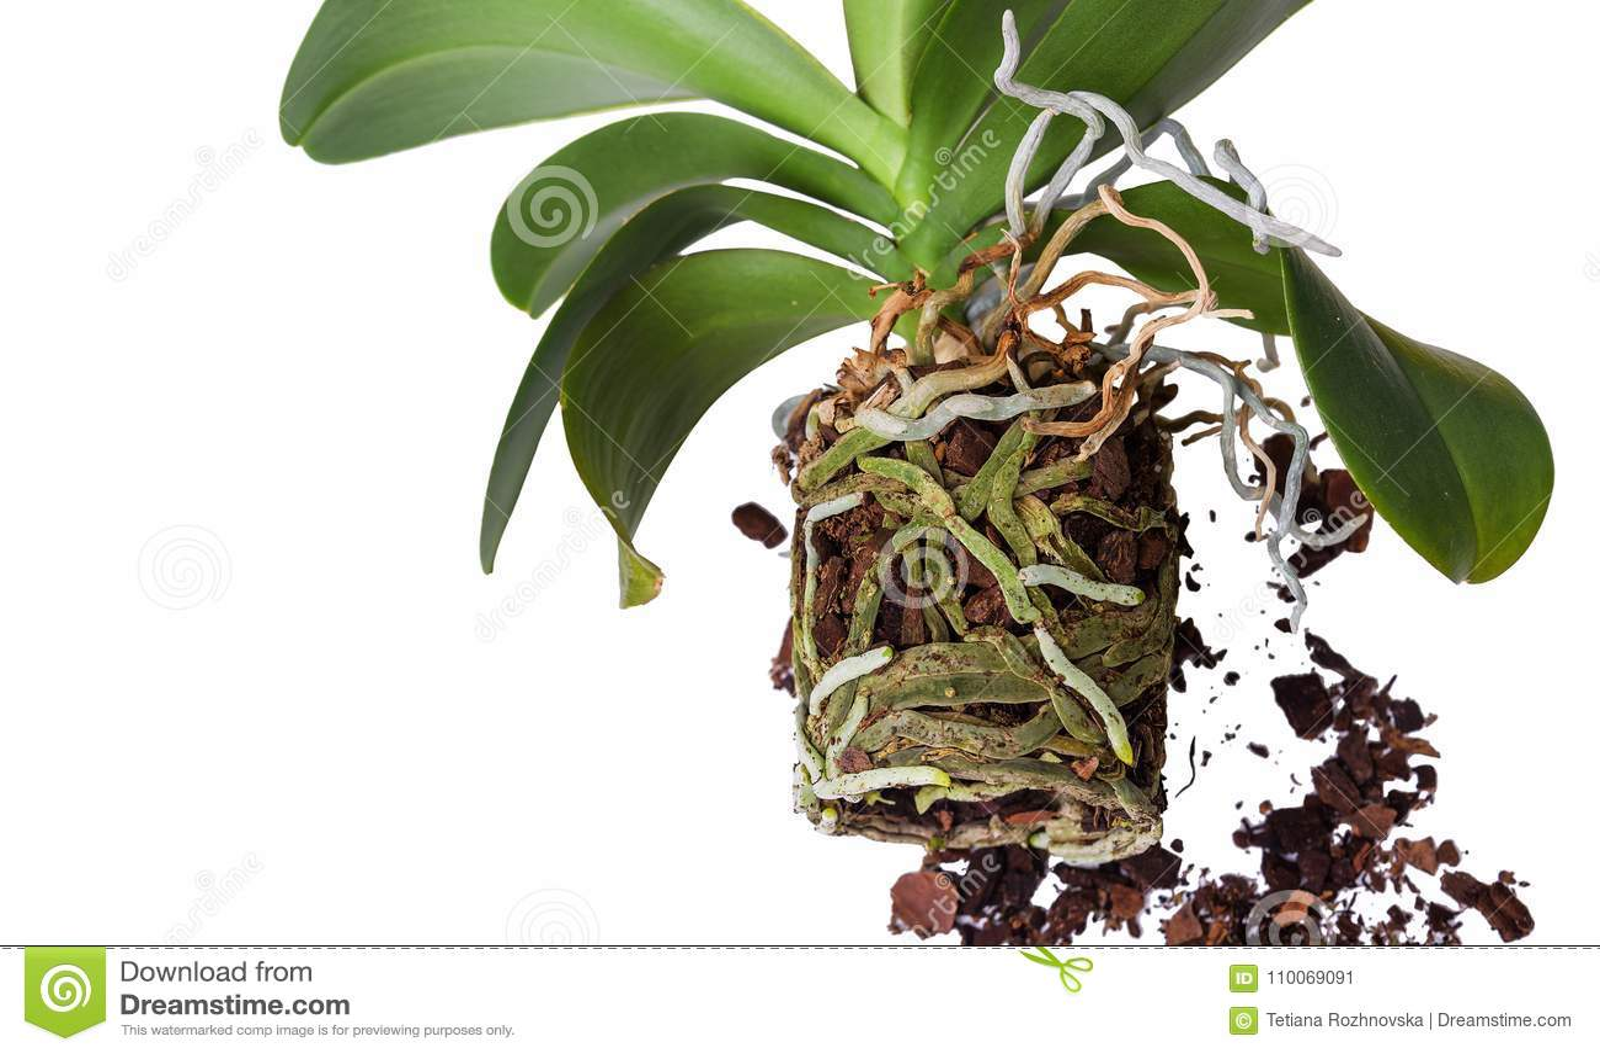 orchid preparation for transplant stock image image of exotic foliage 110069091. Black Bedroom Furniture Sets. Home Design Ideas